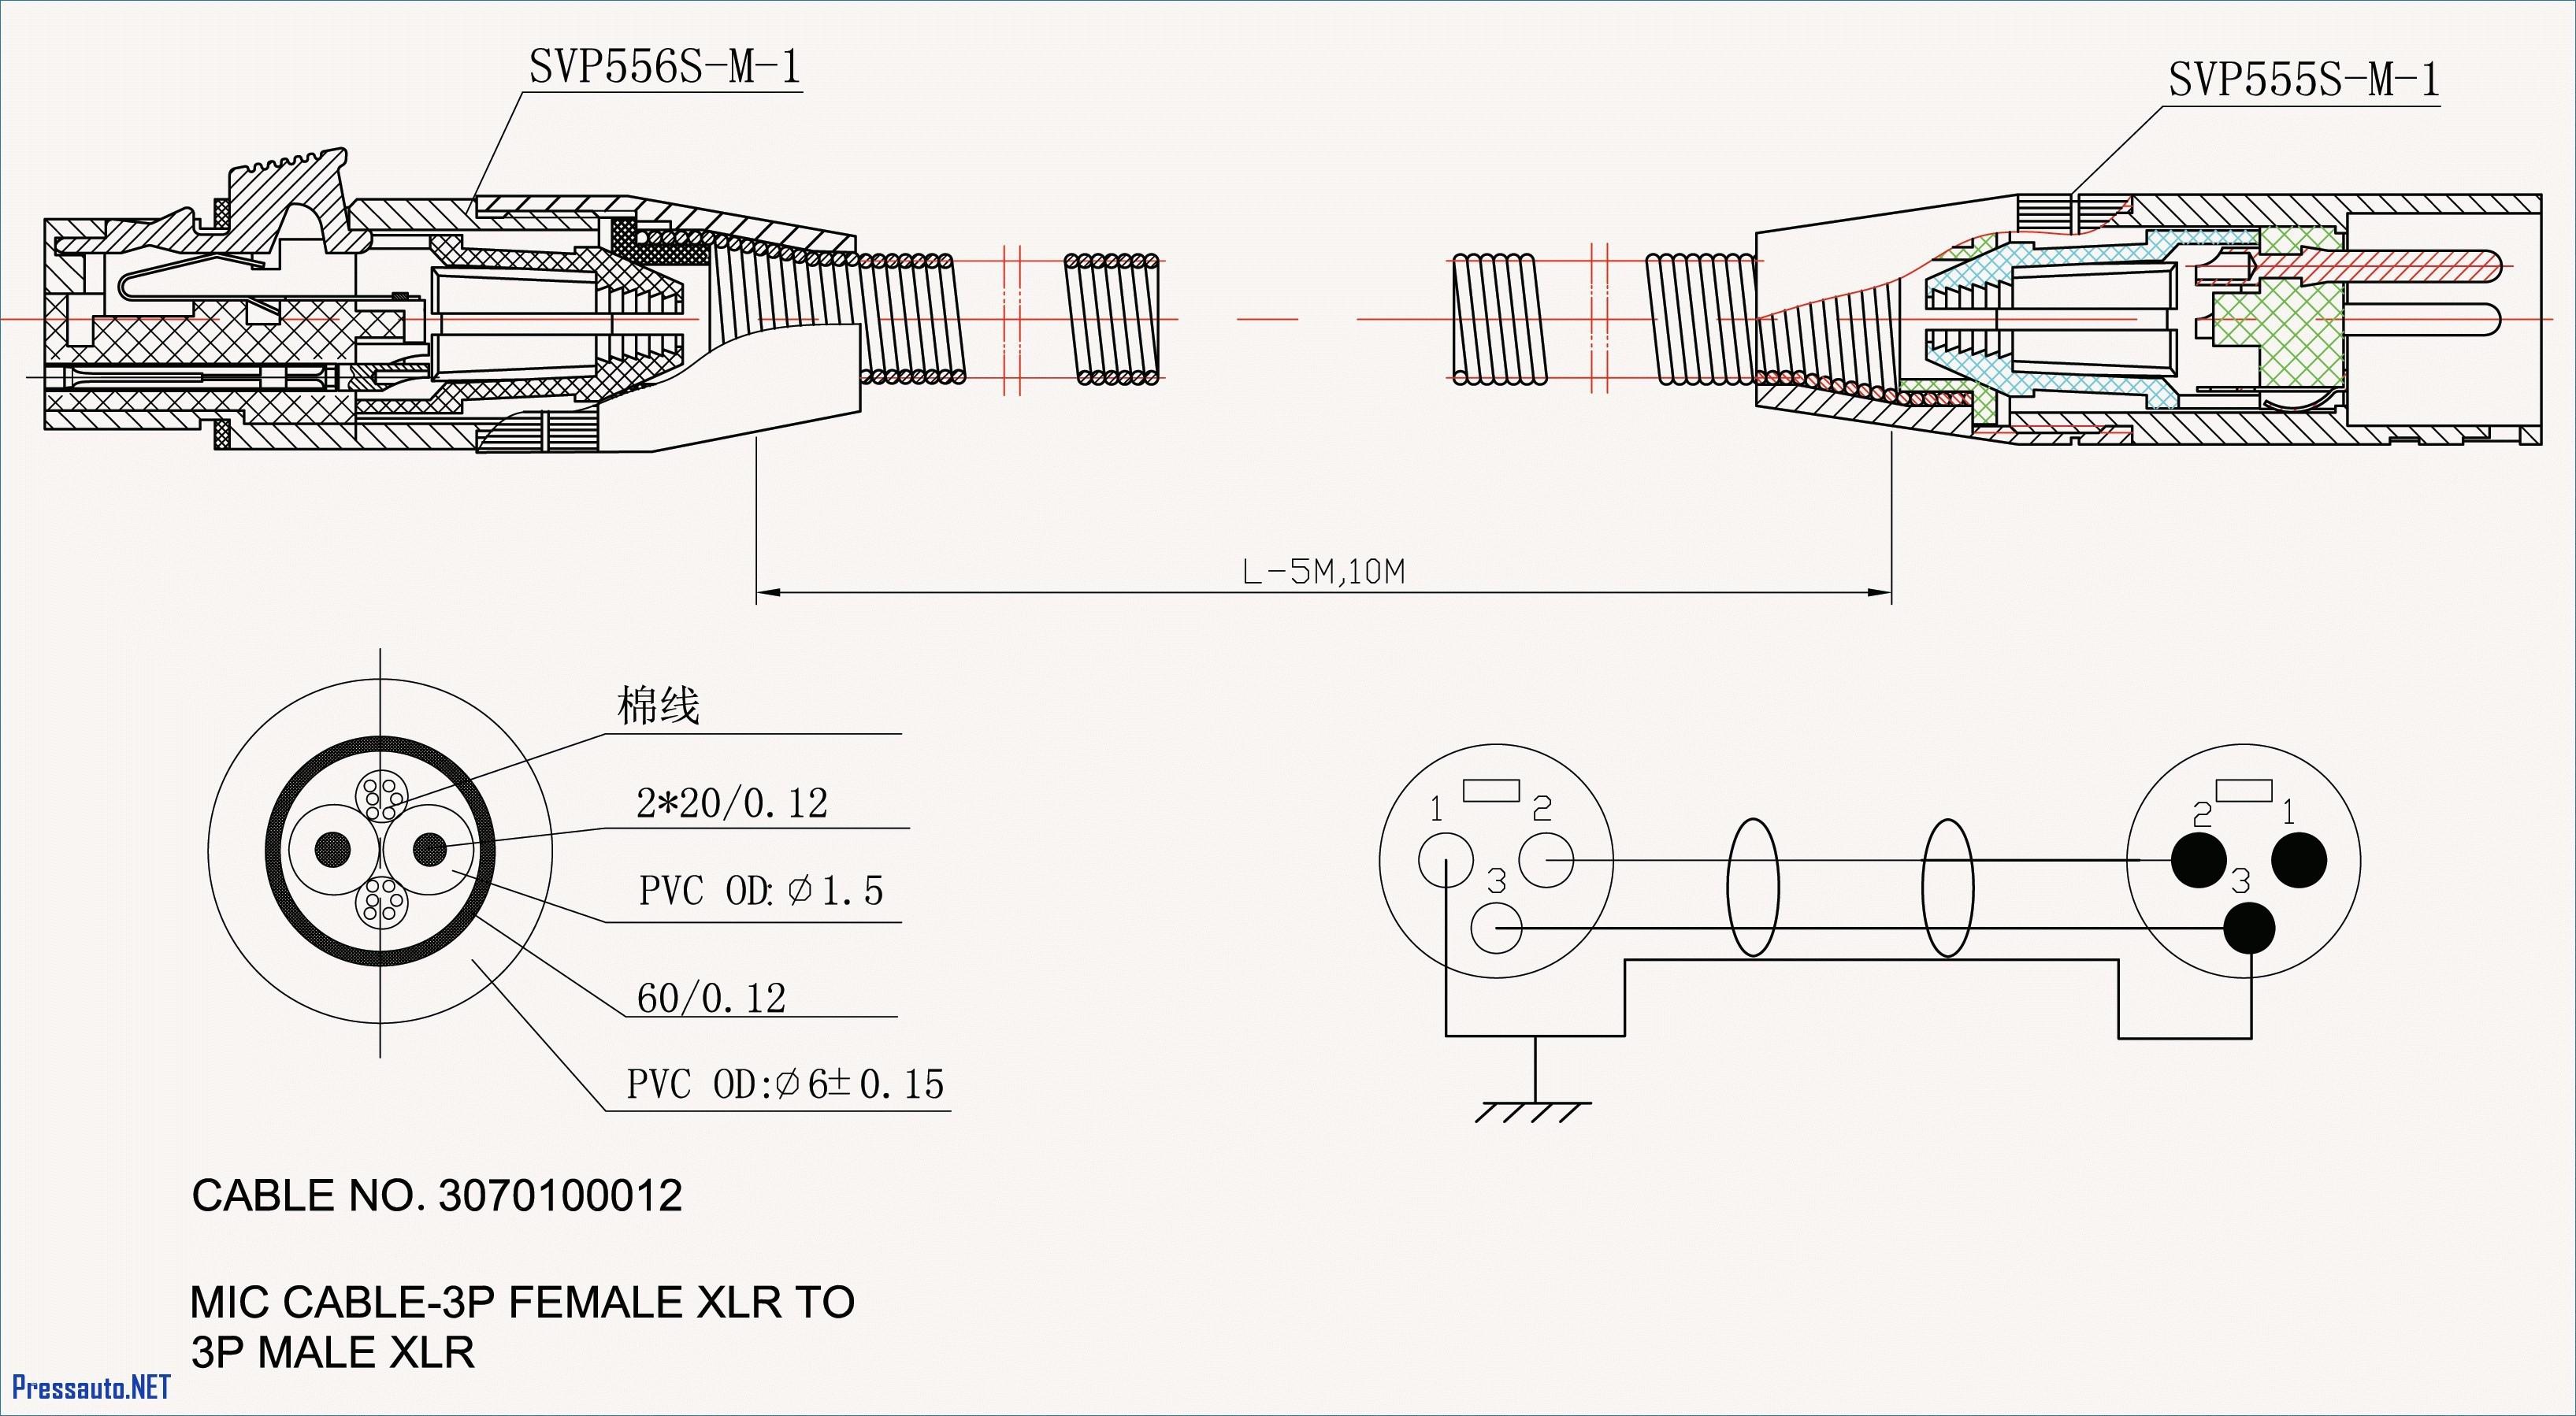 Electric Motor Parts Diagram Phantom Wiring Diagram Of Electric Motor Parts Diagram Electric Motor Control Circuit Diagrams Motor Repalcement Parts and